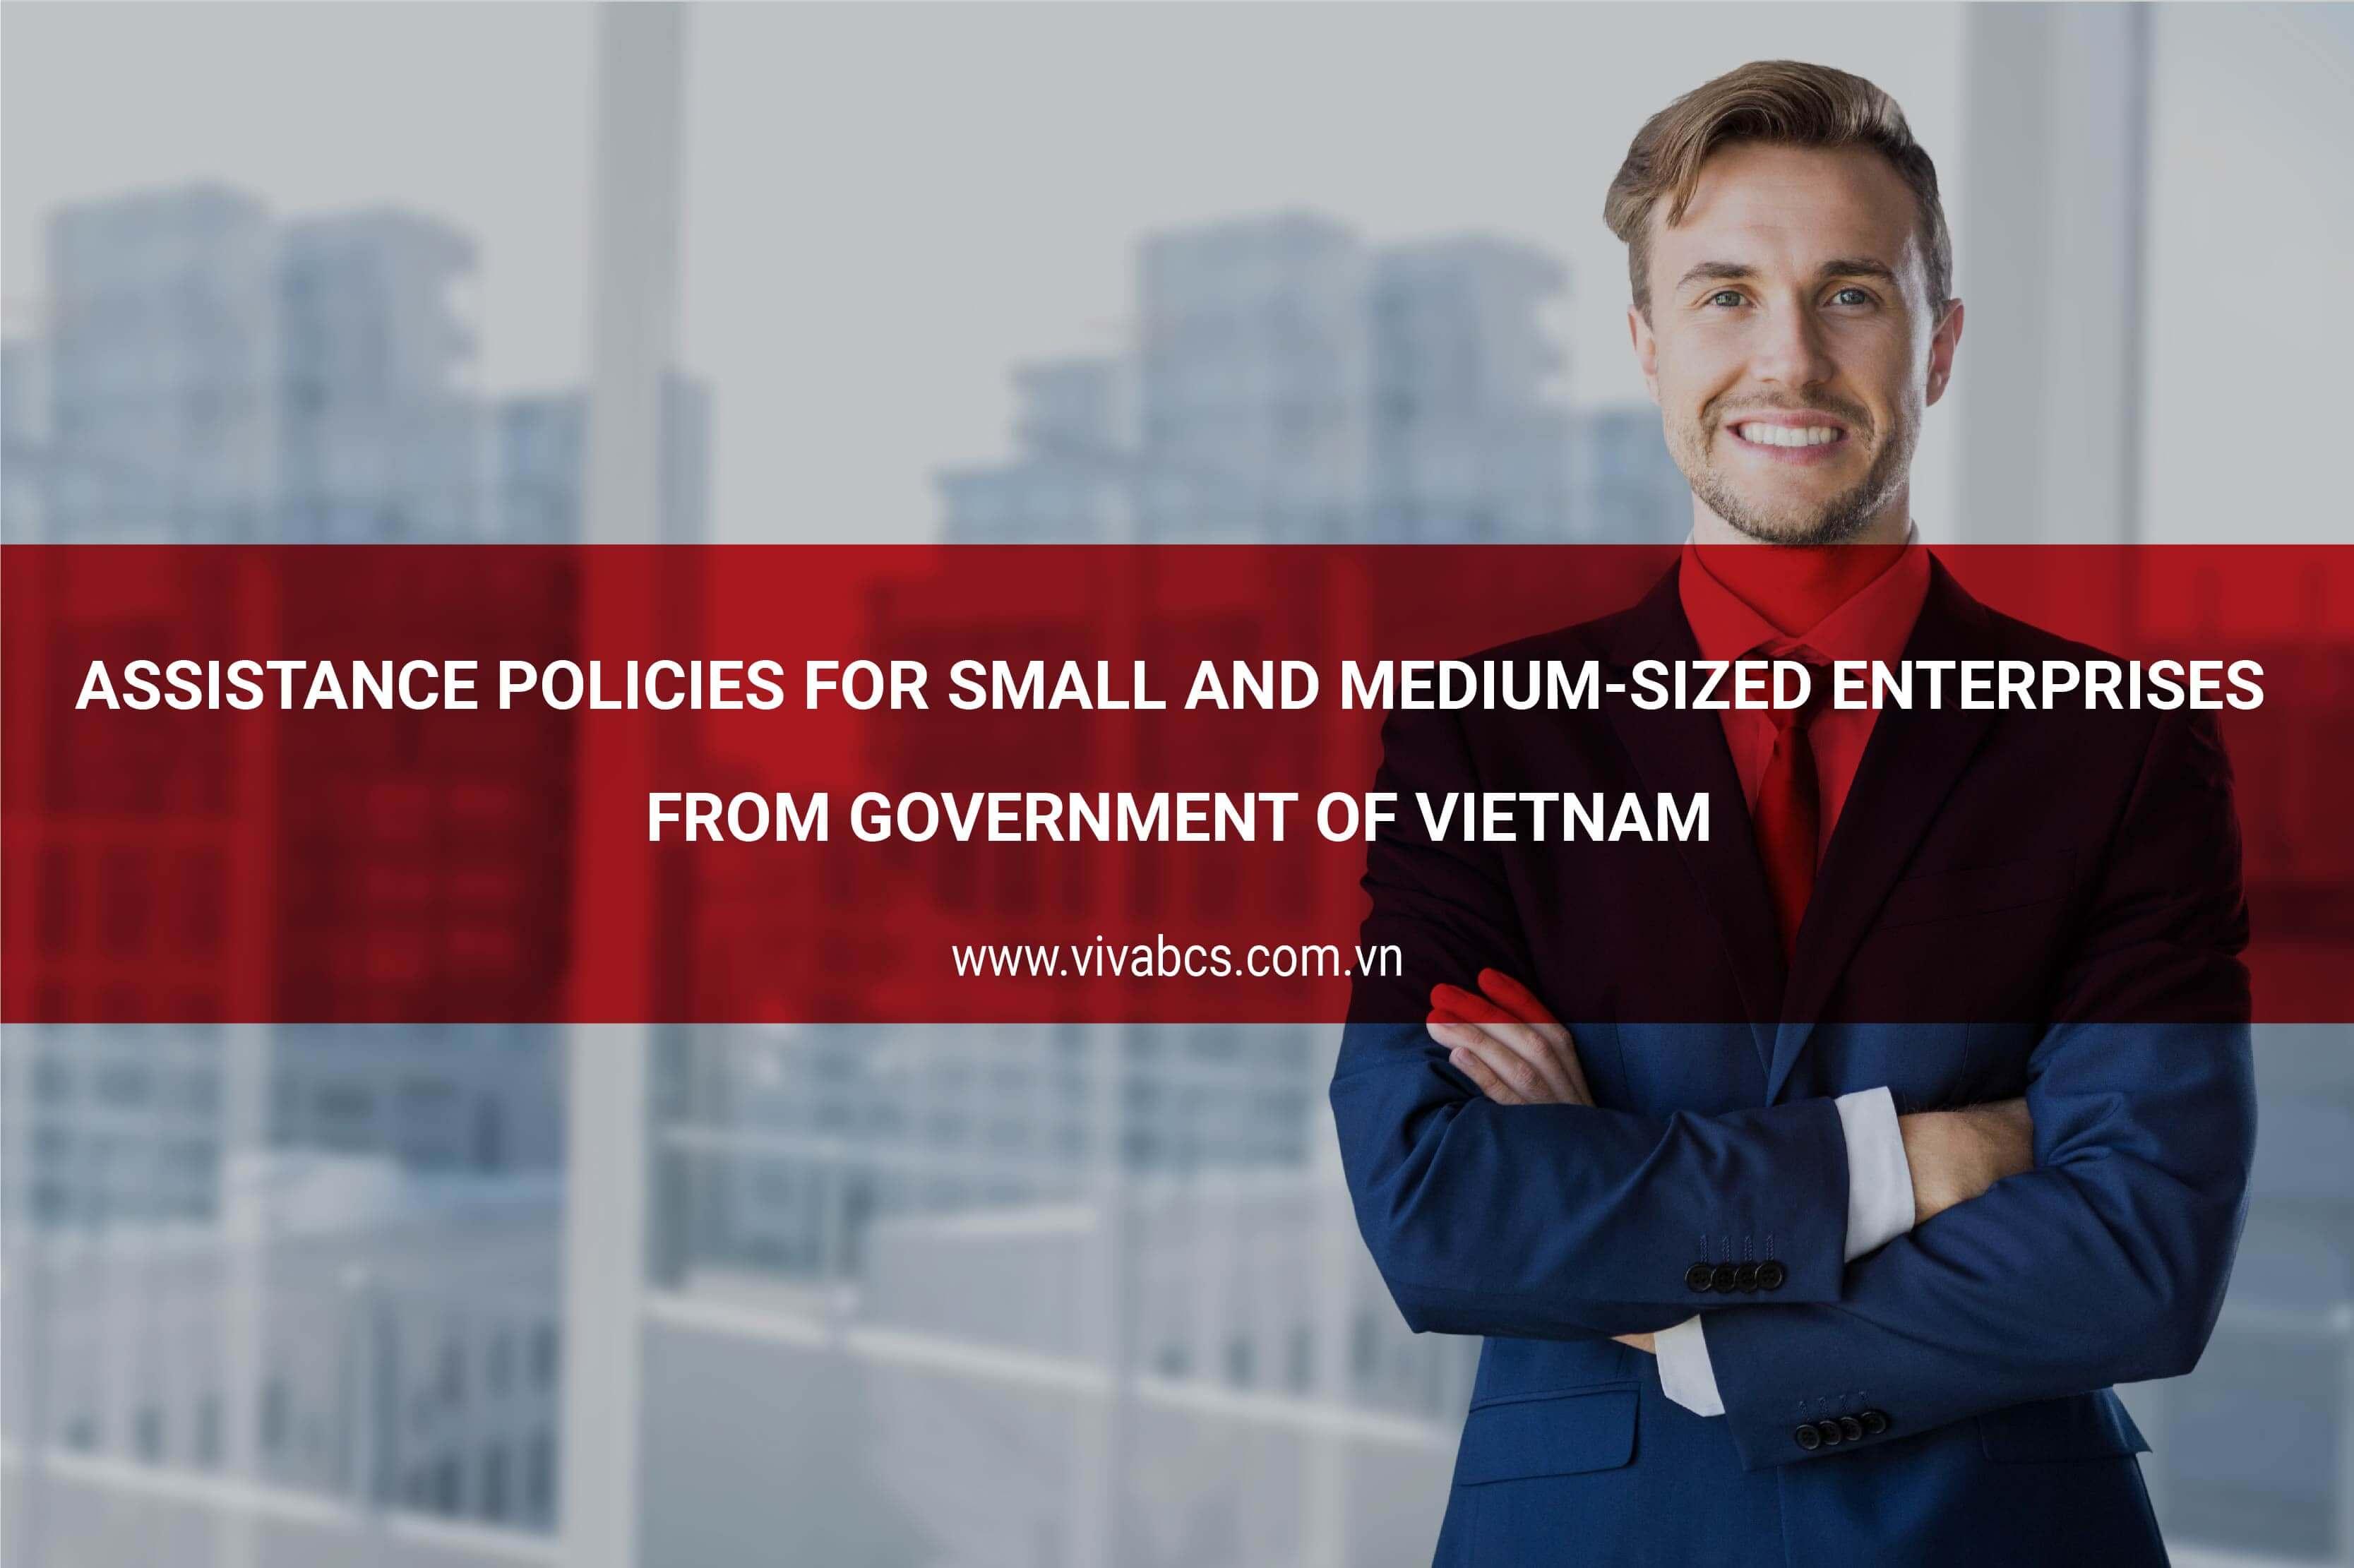 Small and medium-sized enterprises